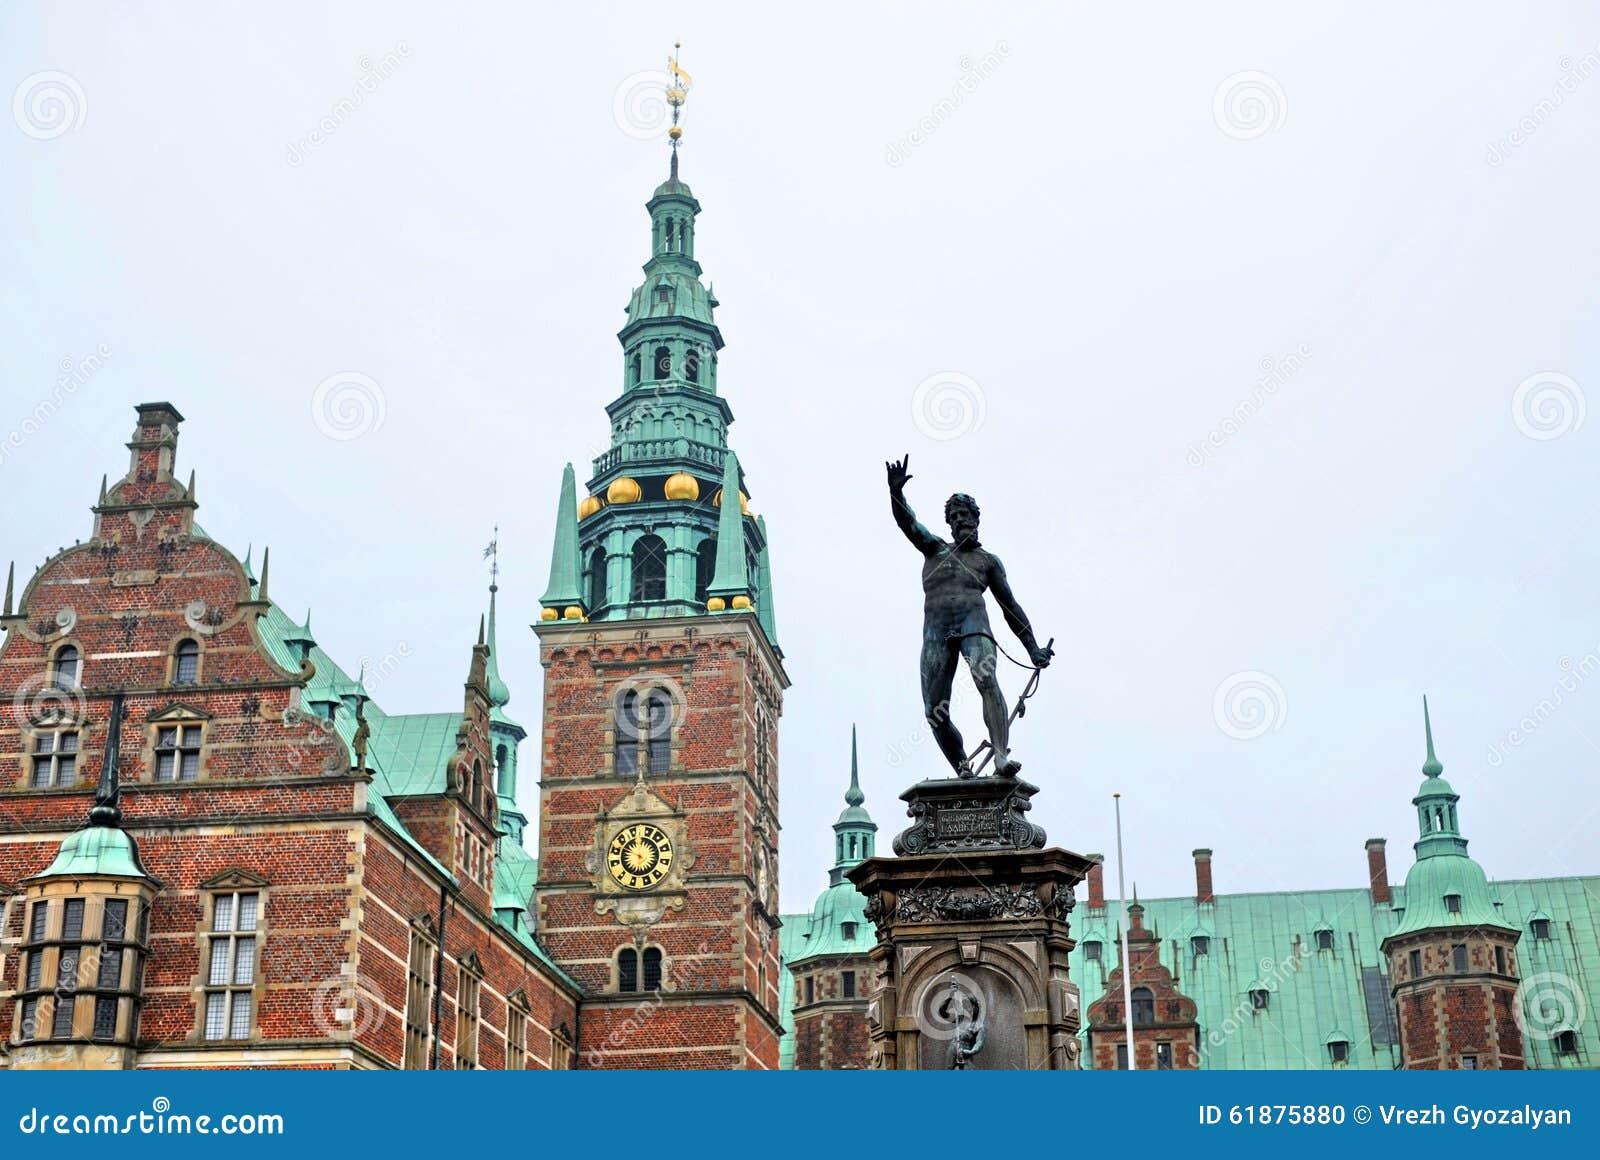 Castelo de Frederiksborg em Hillerod, Dinamarca